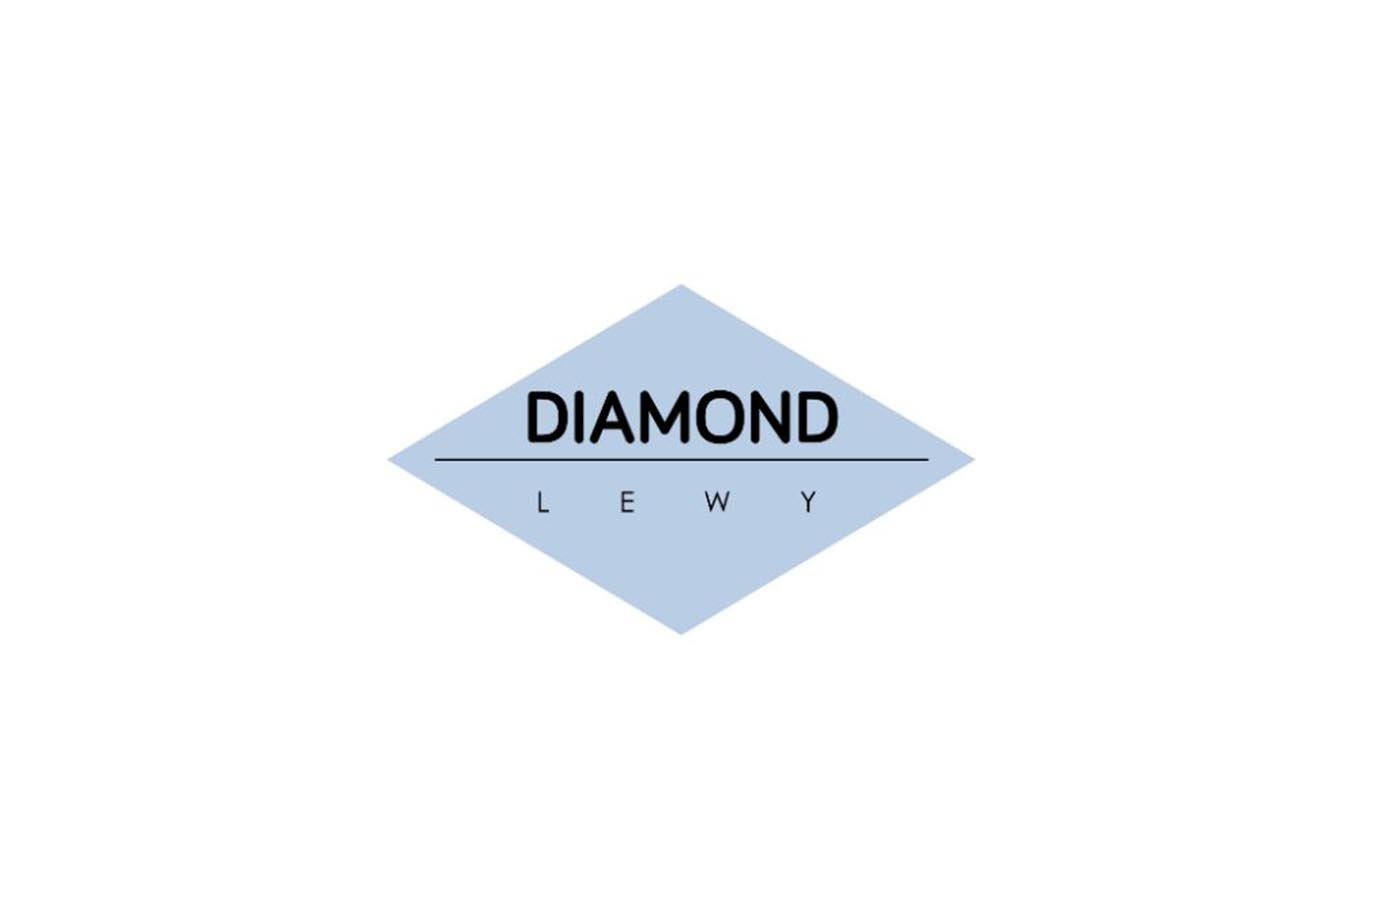 Diamond Lewy